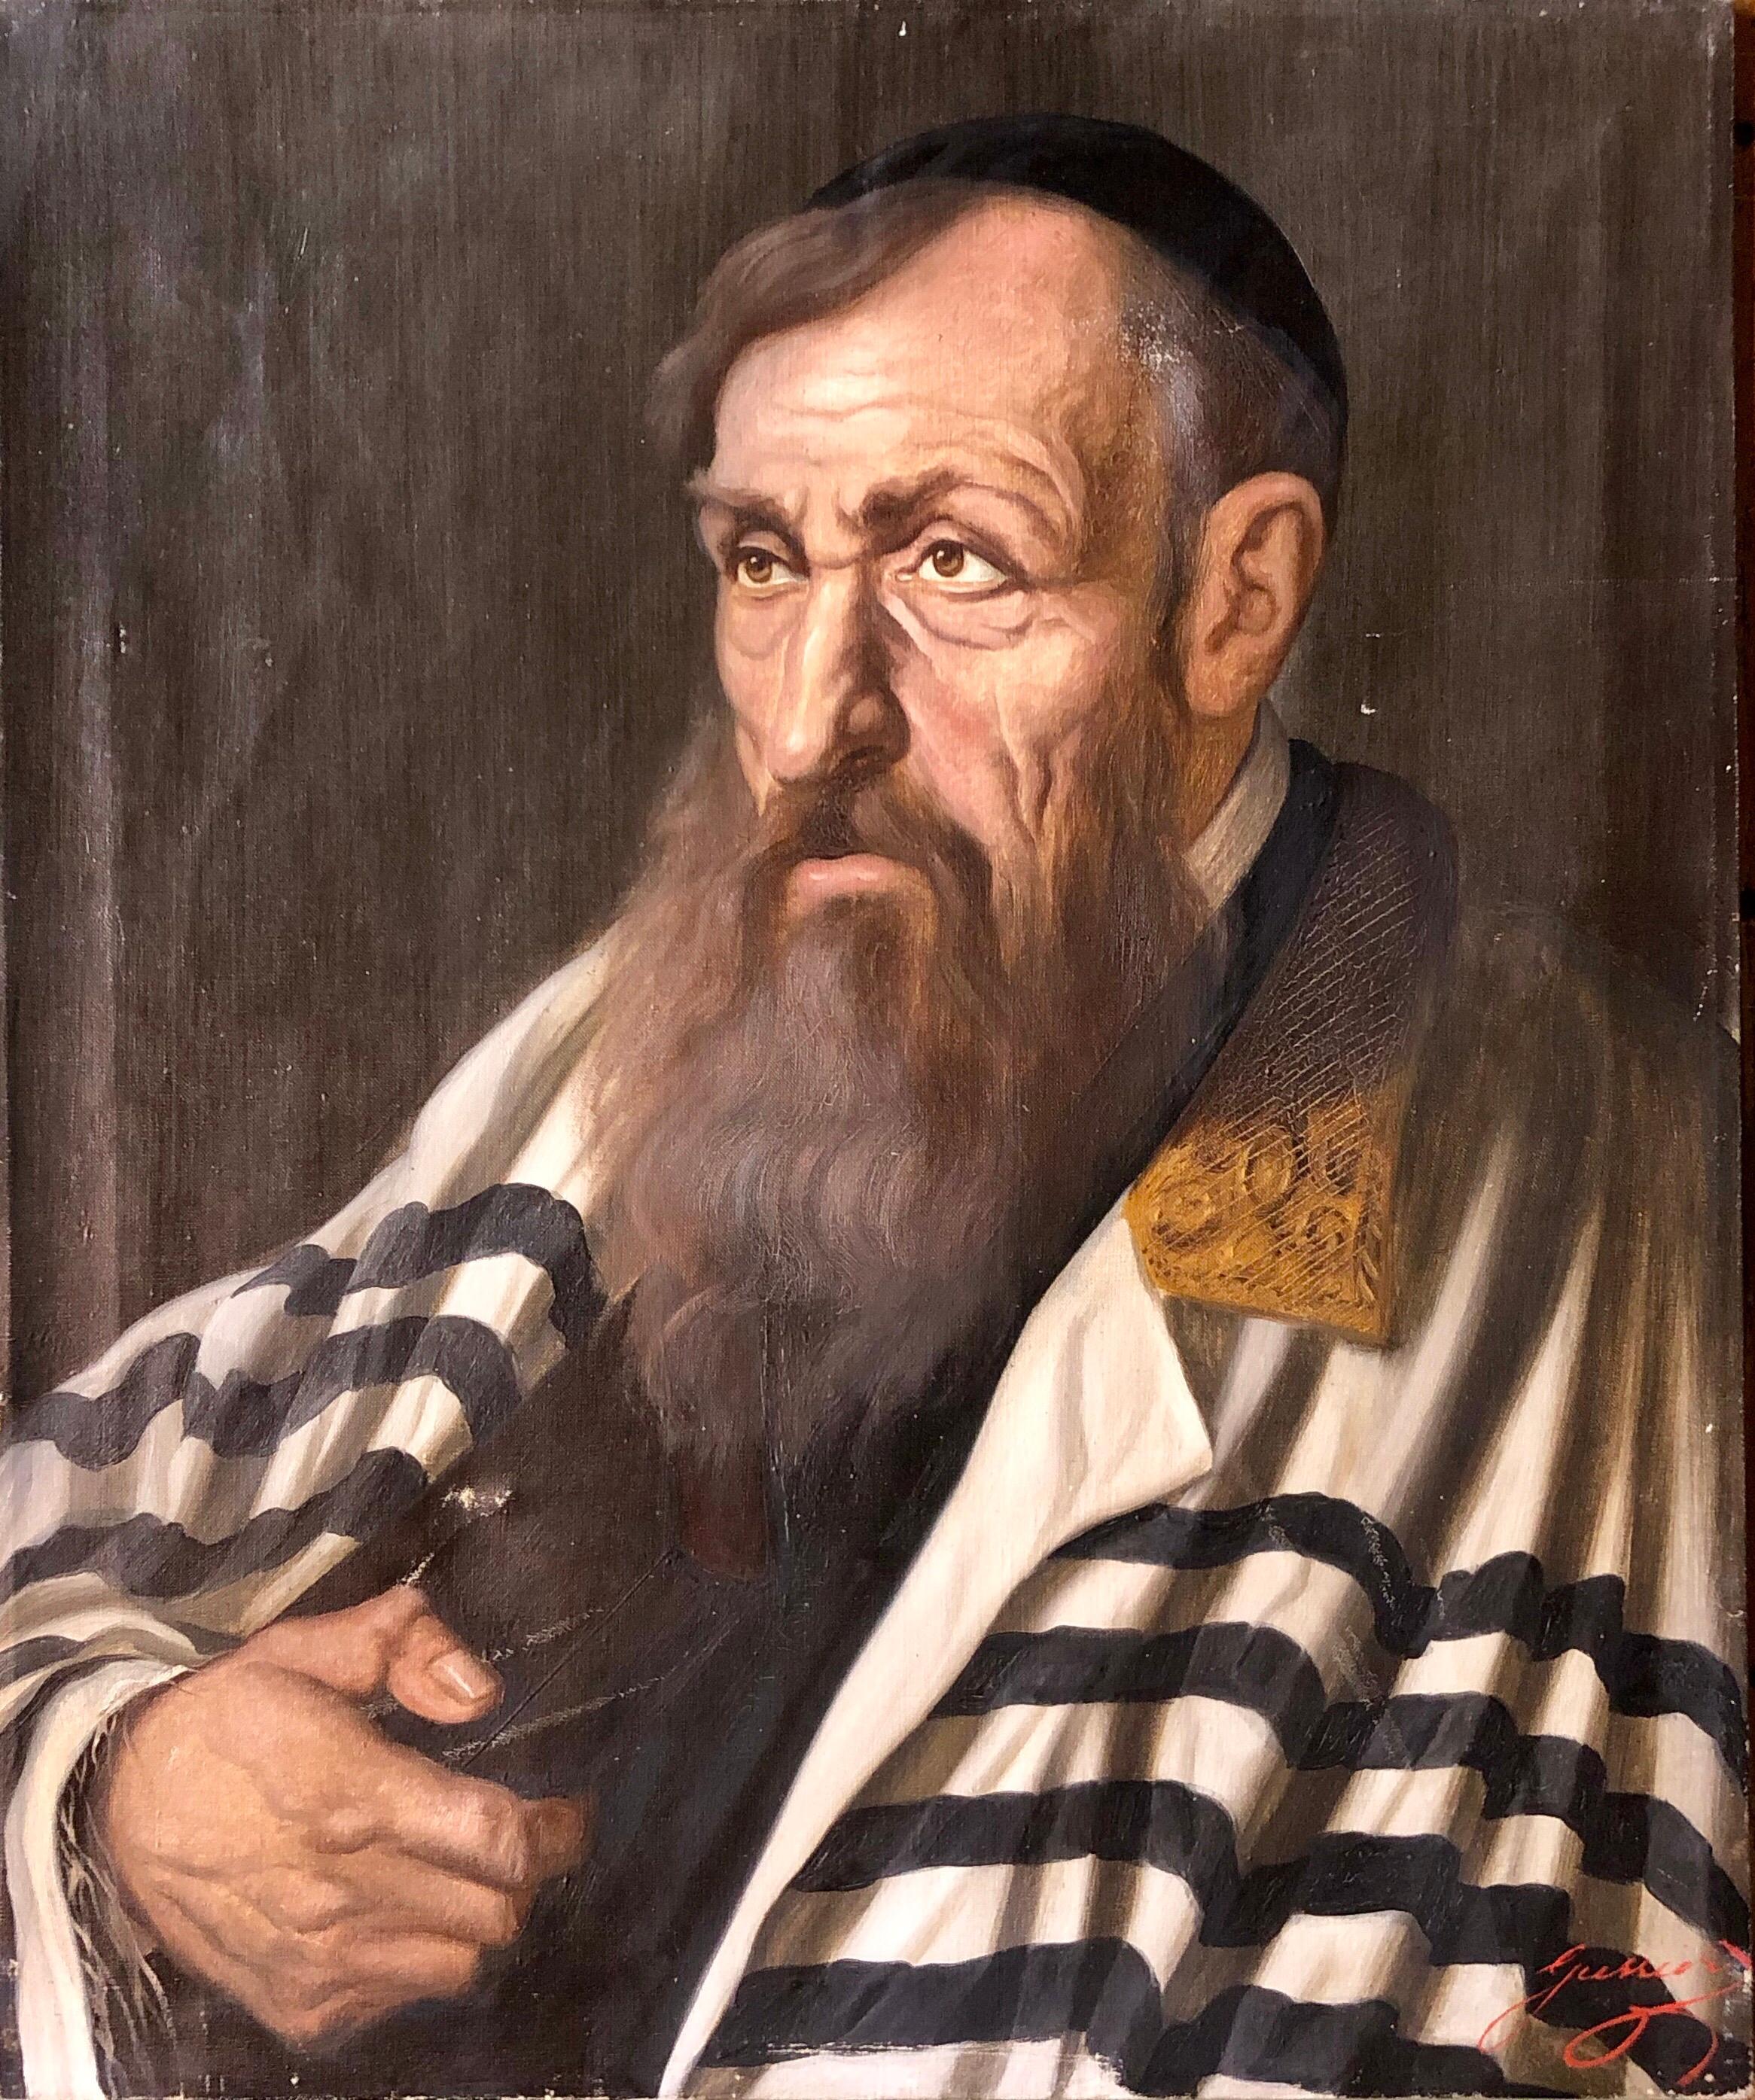 Polish Judaica Portrait of Hasidic Rabbi with Tallit Synagogue Oil Painting